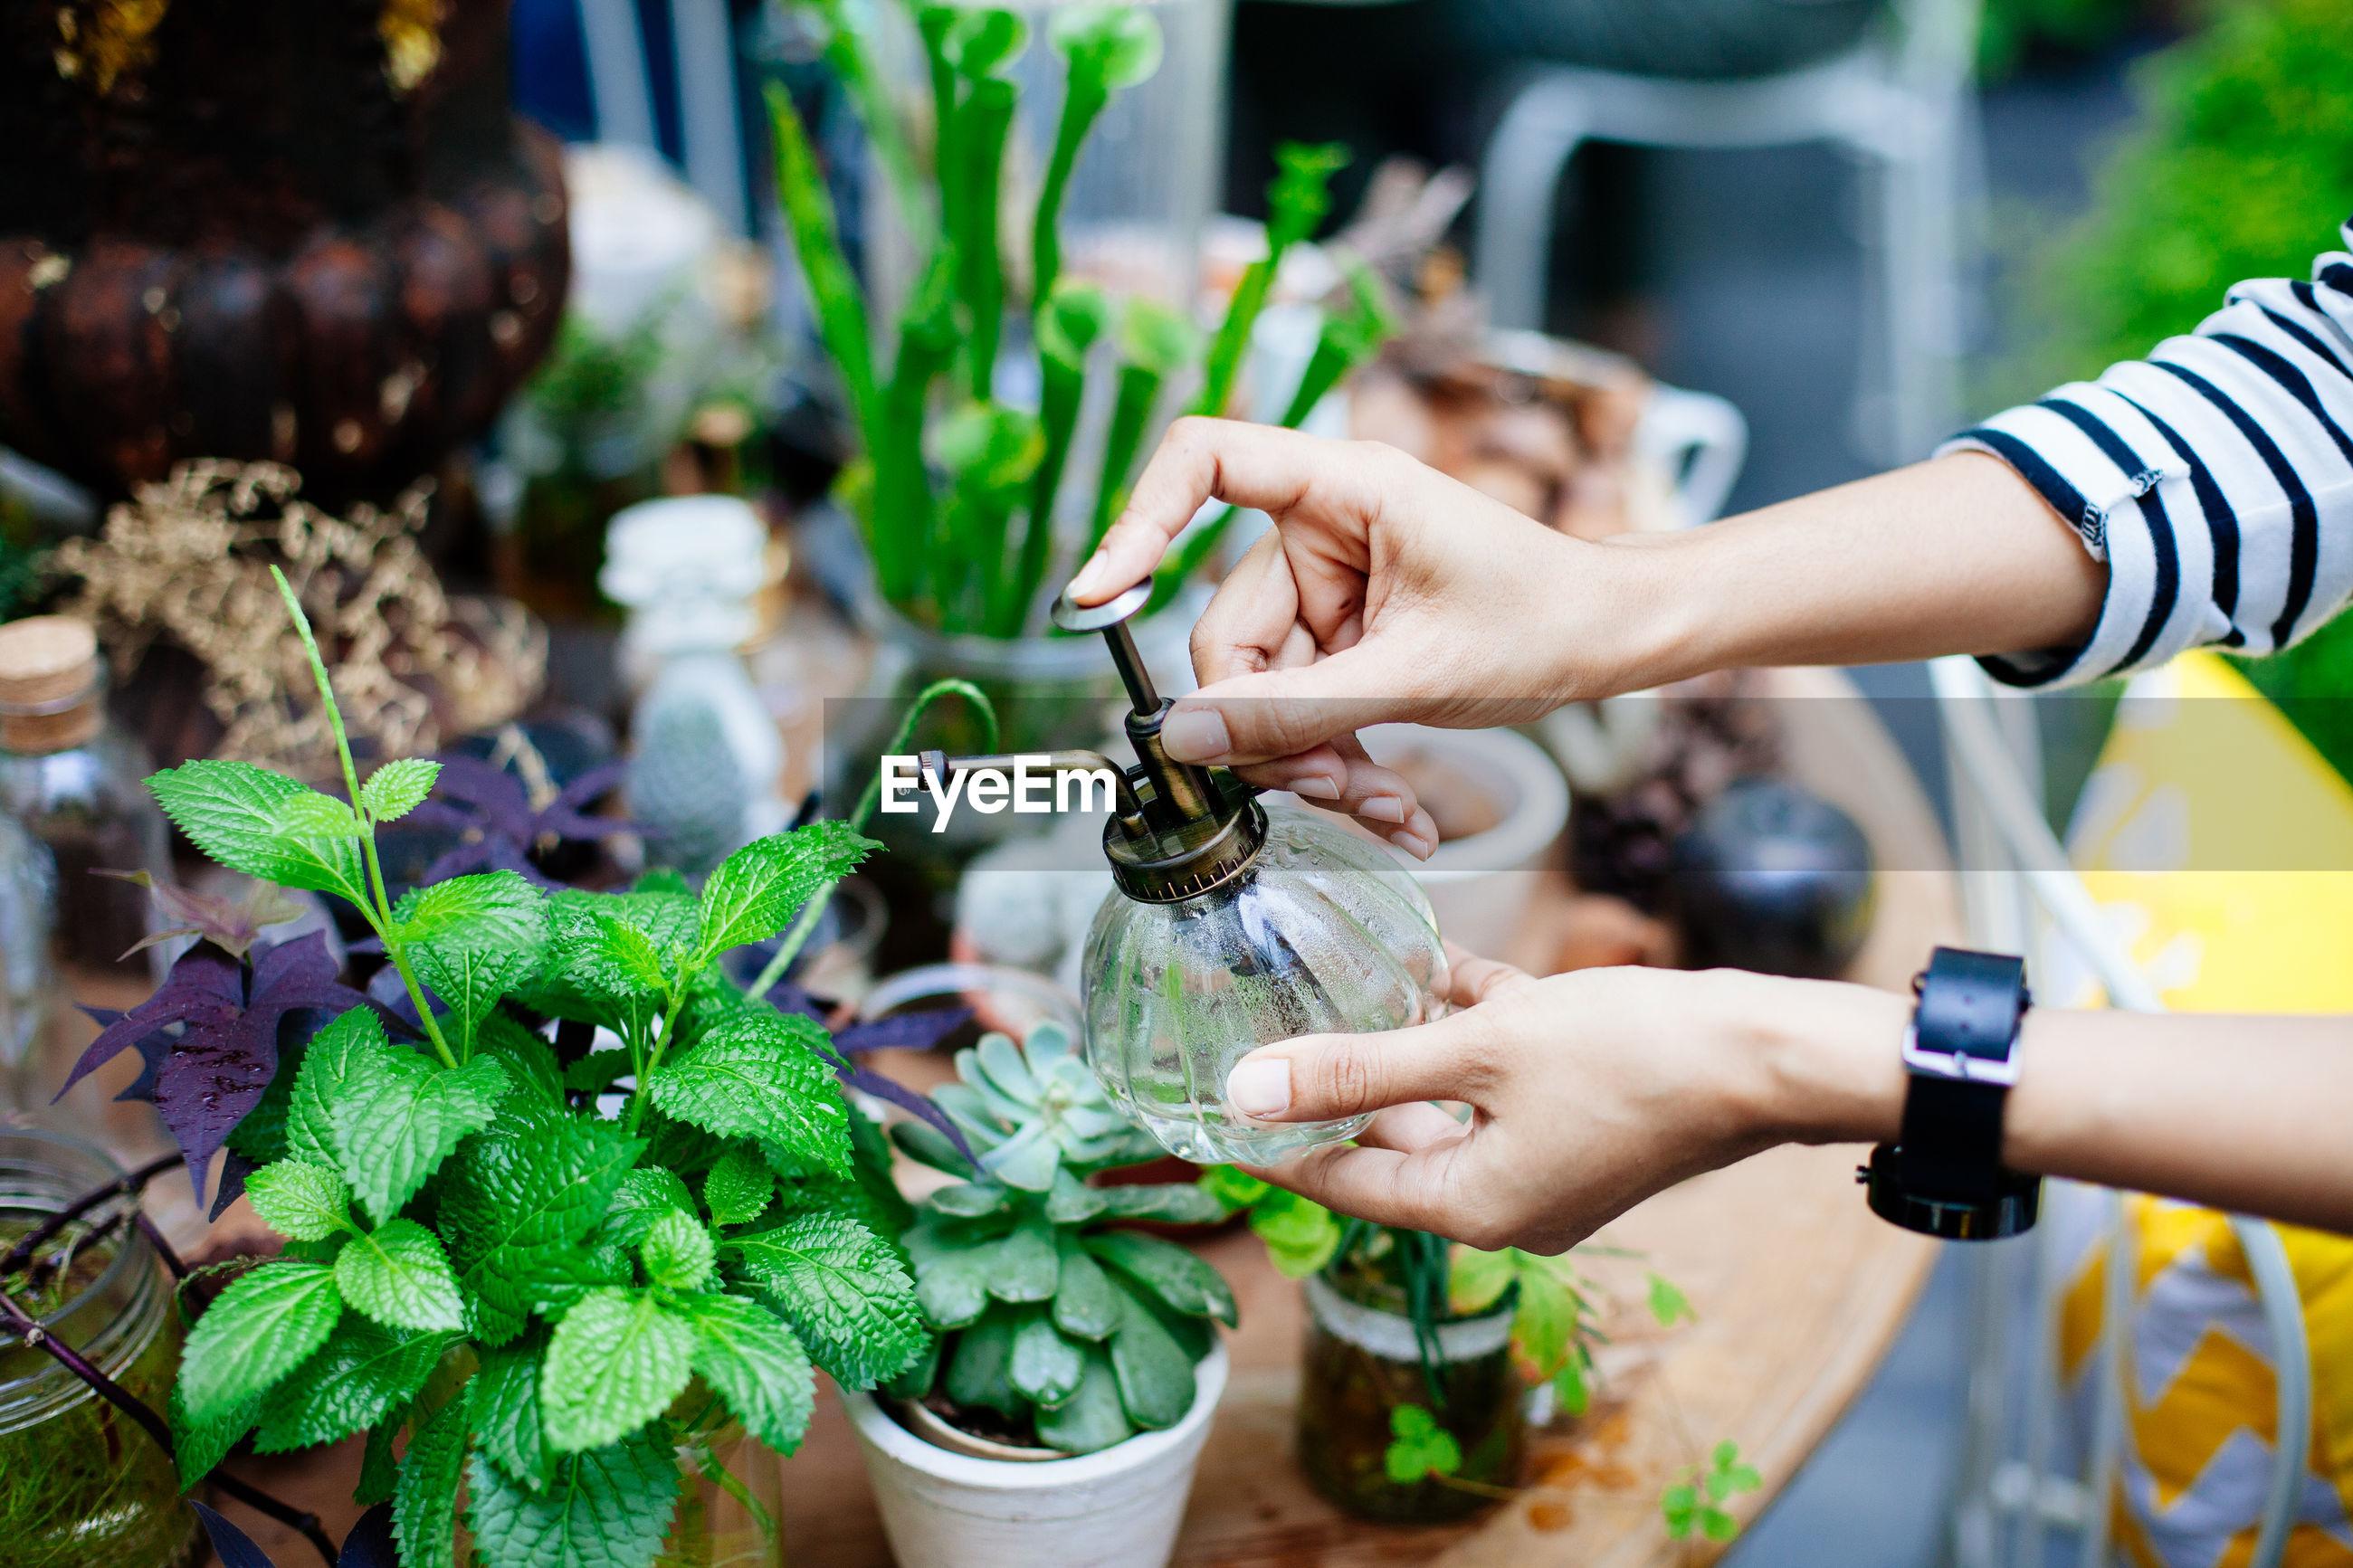 Florist spraying water on plants